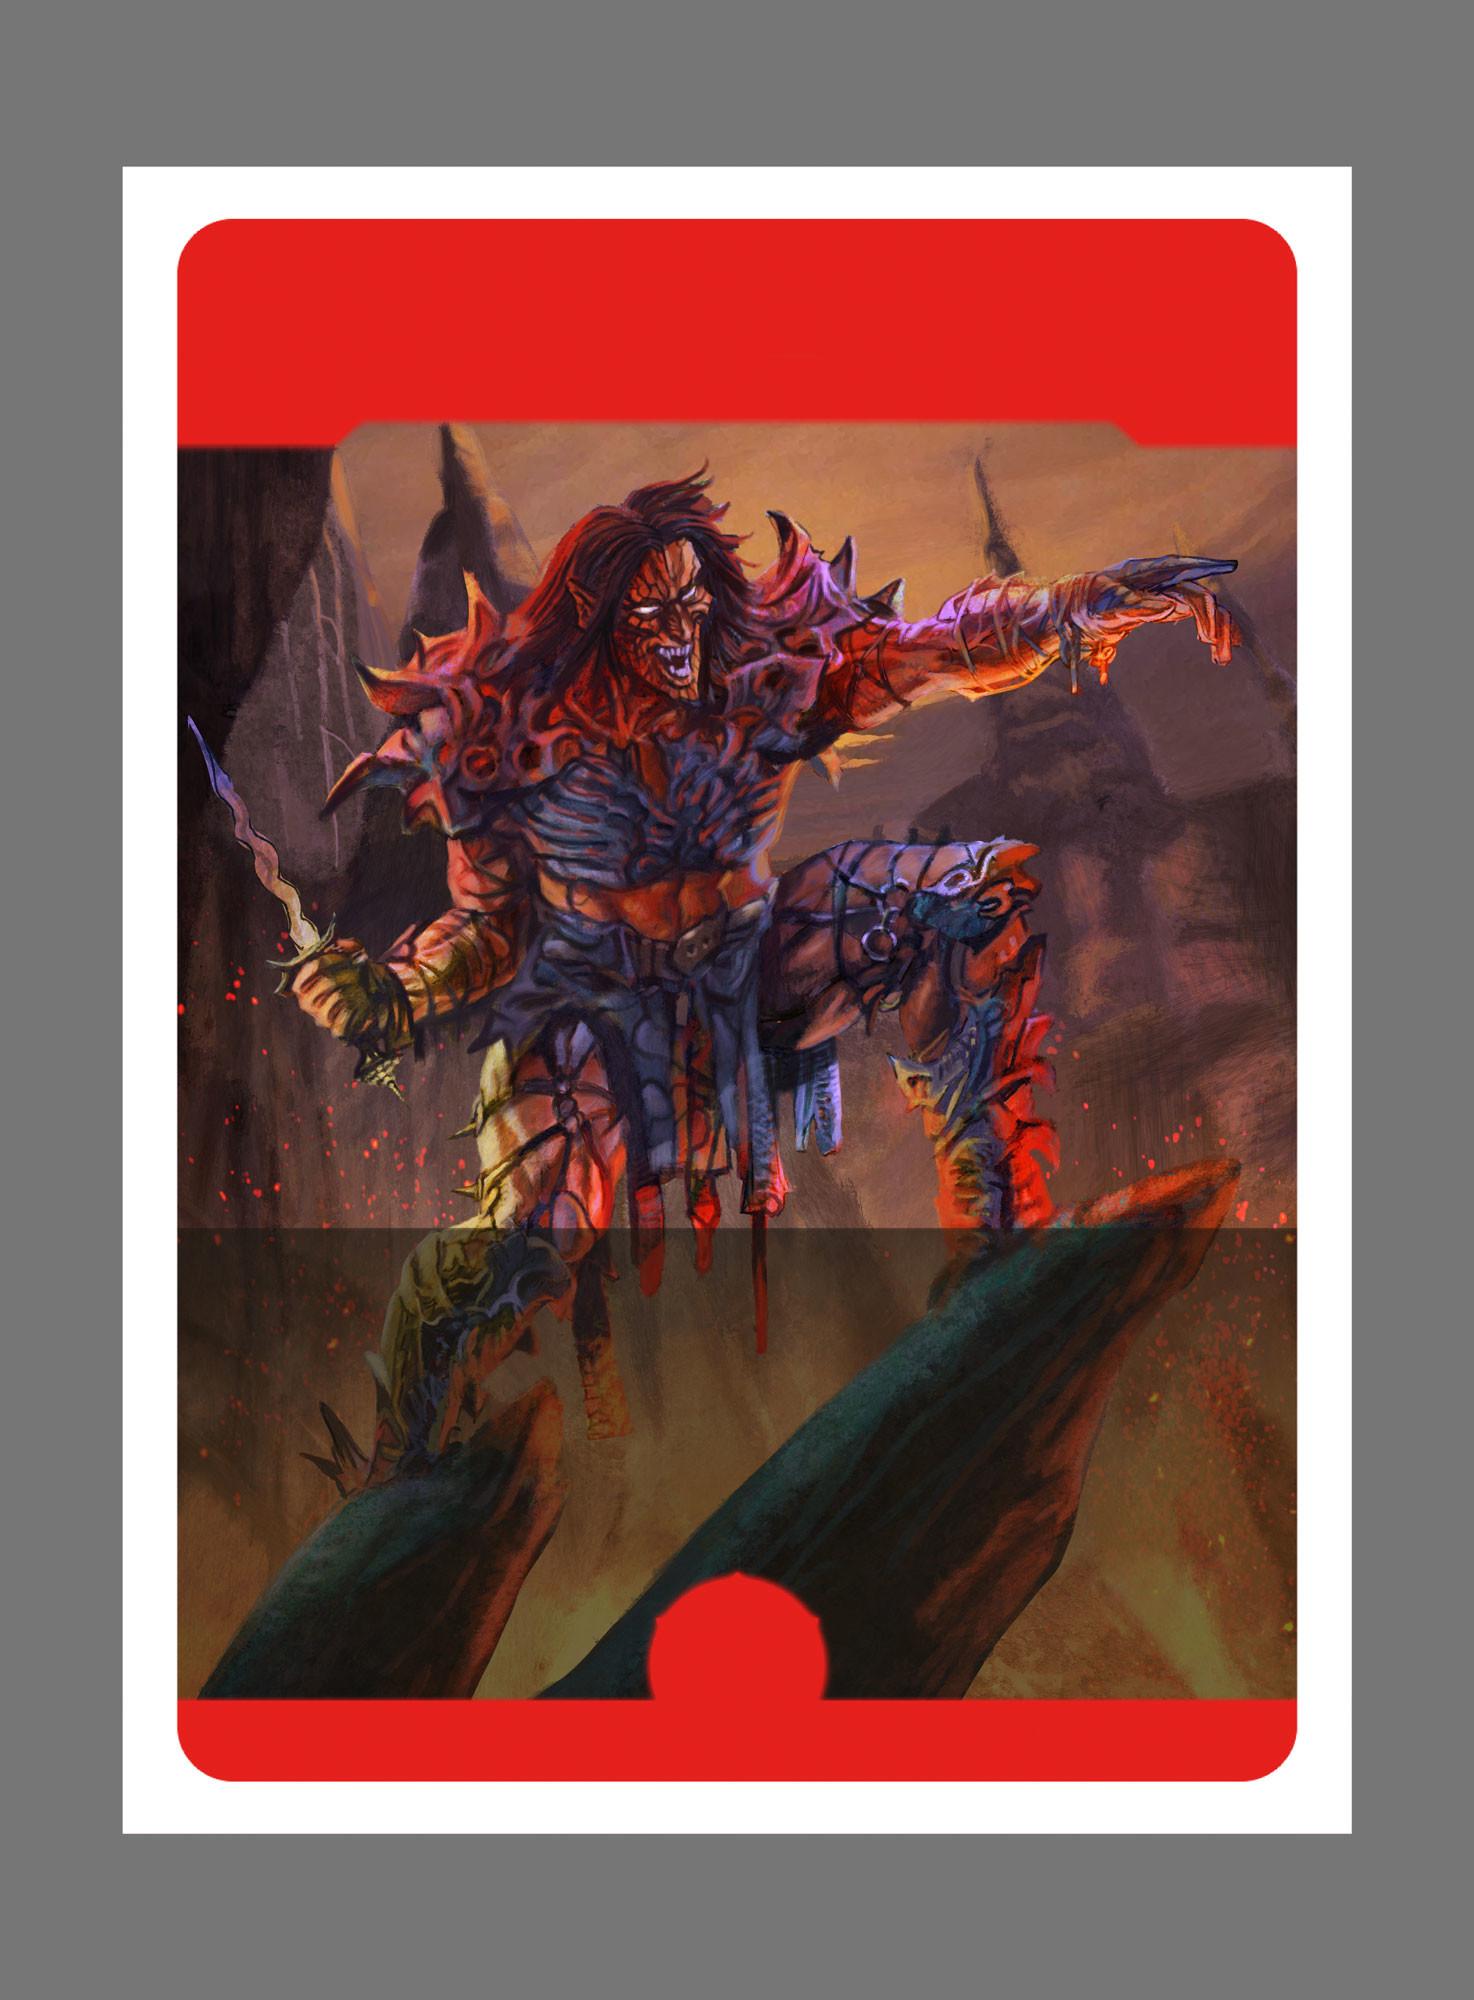 Daniele afferni daniele afferni artist dragoborne commanderkrict illustration wip